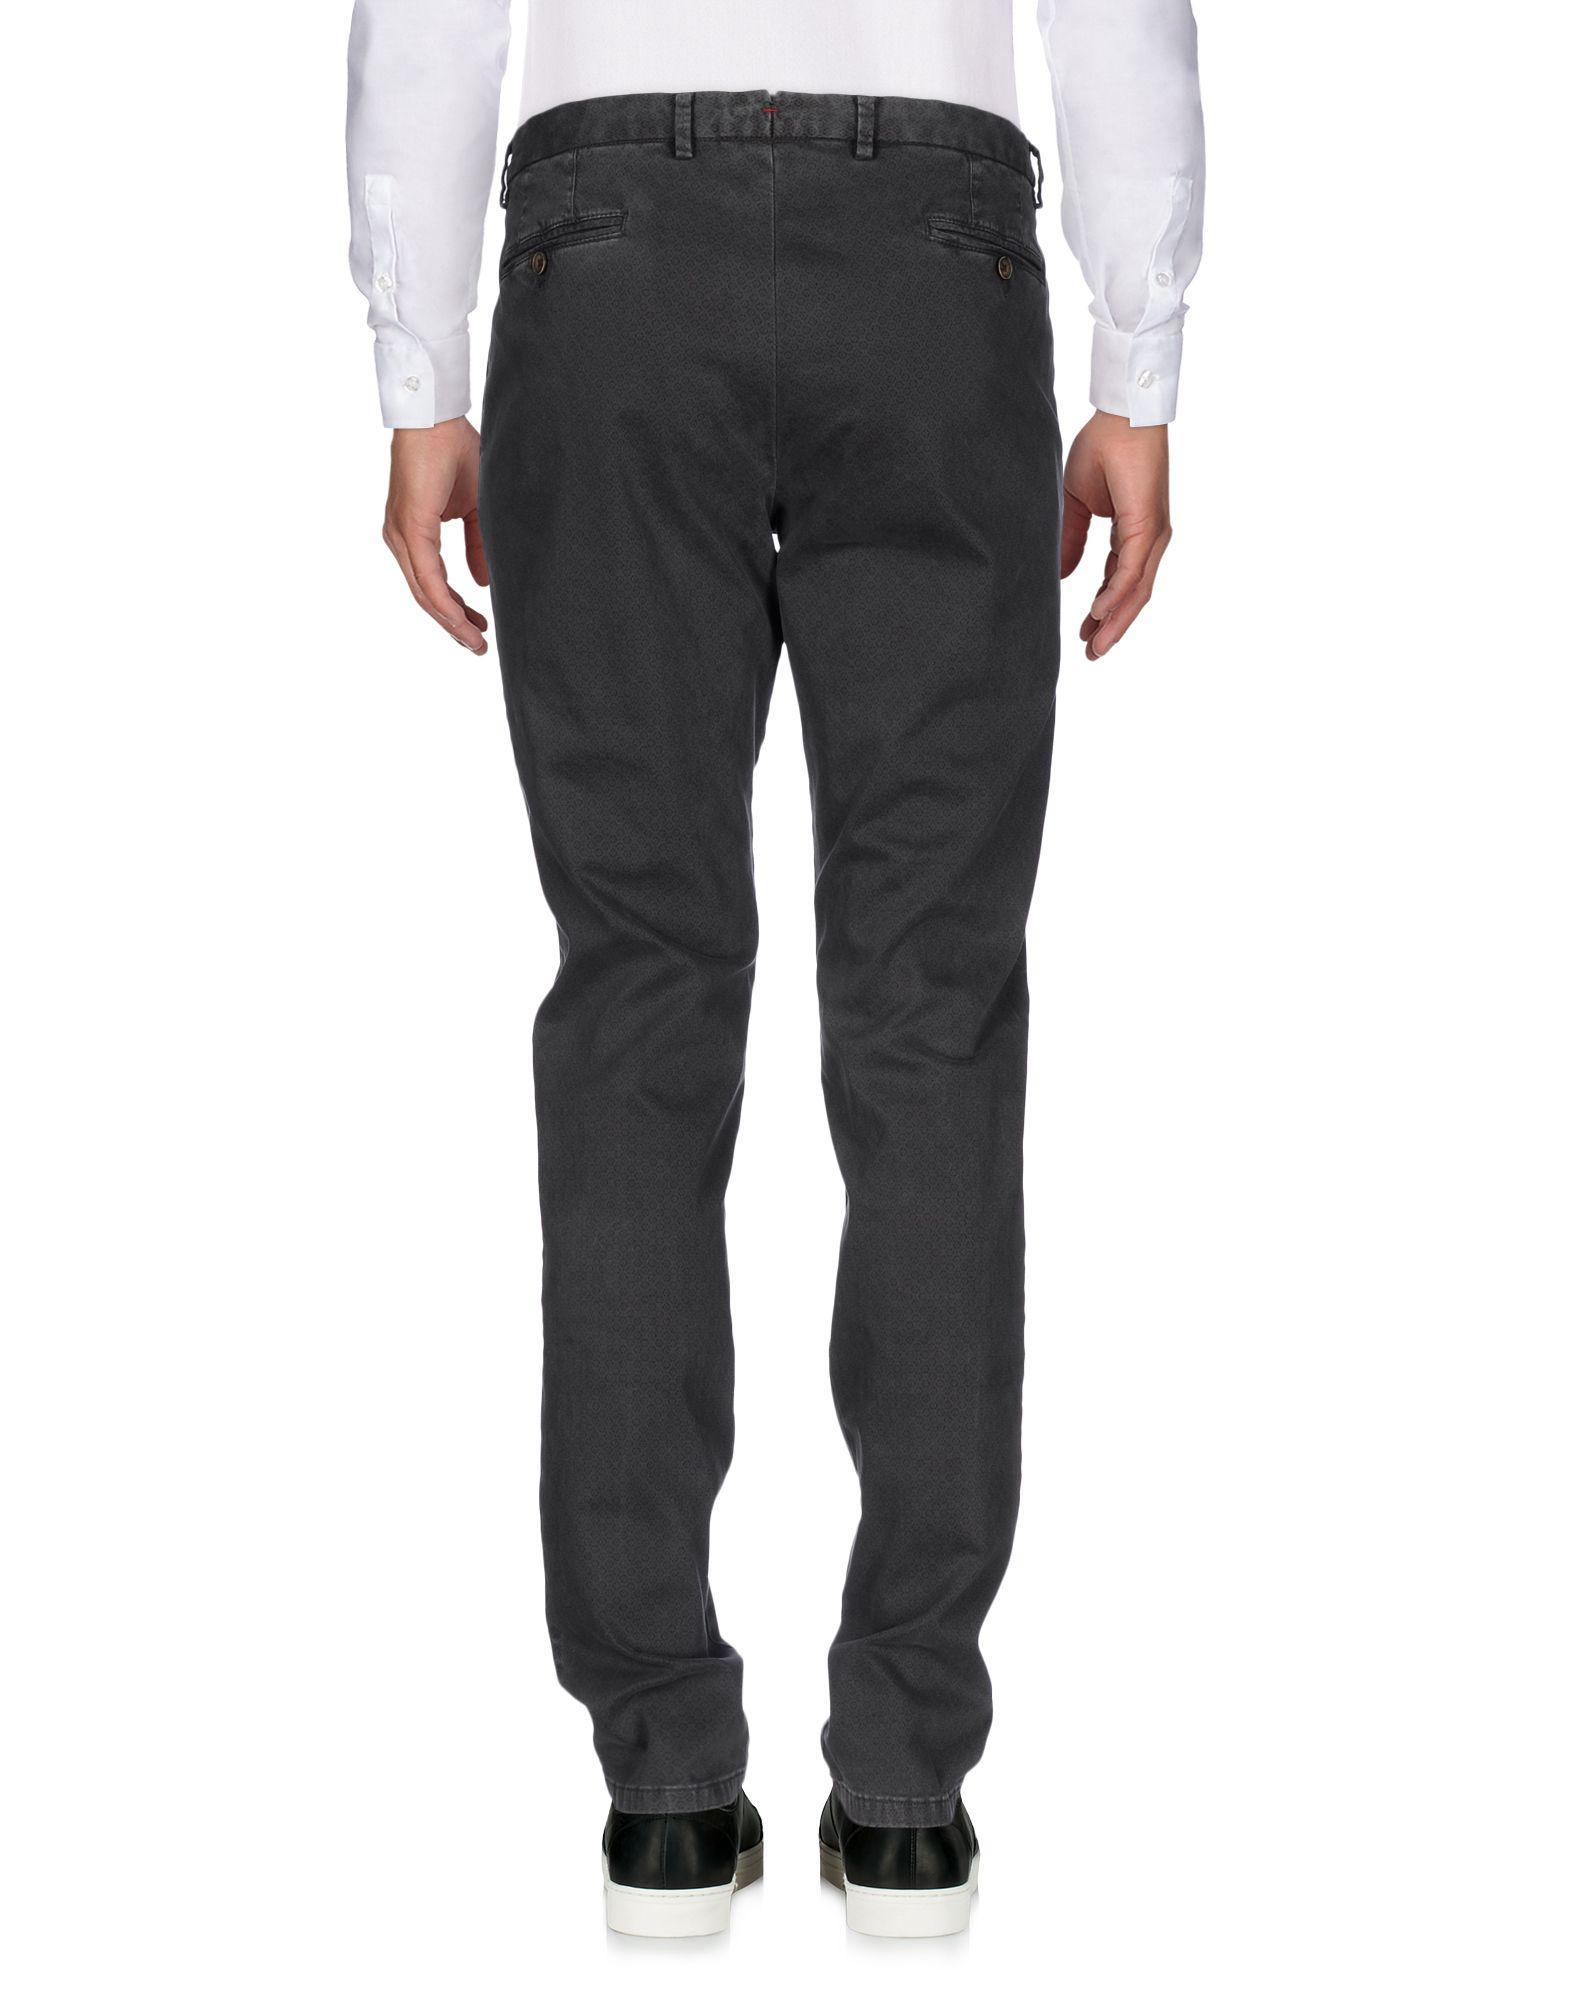 Maestrami Cotton Casual Trouser in Lead (Grey) for Men